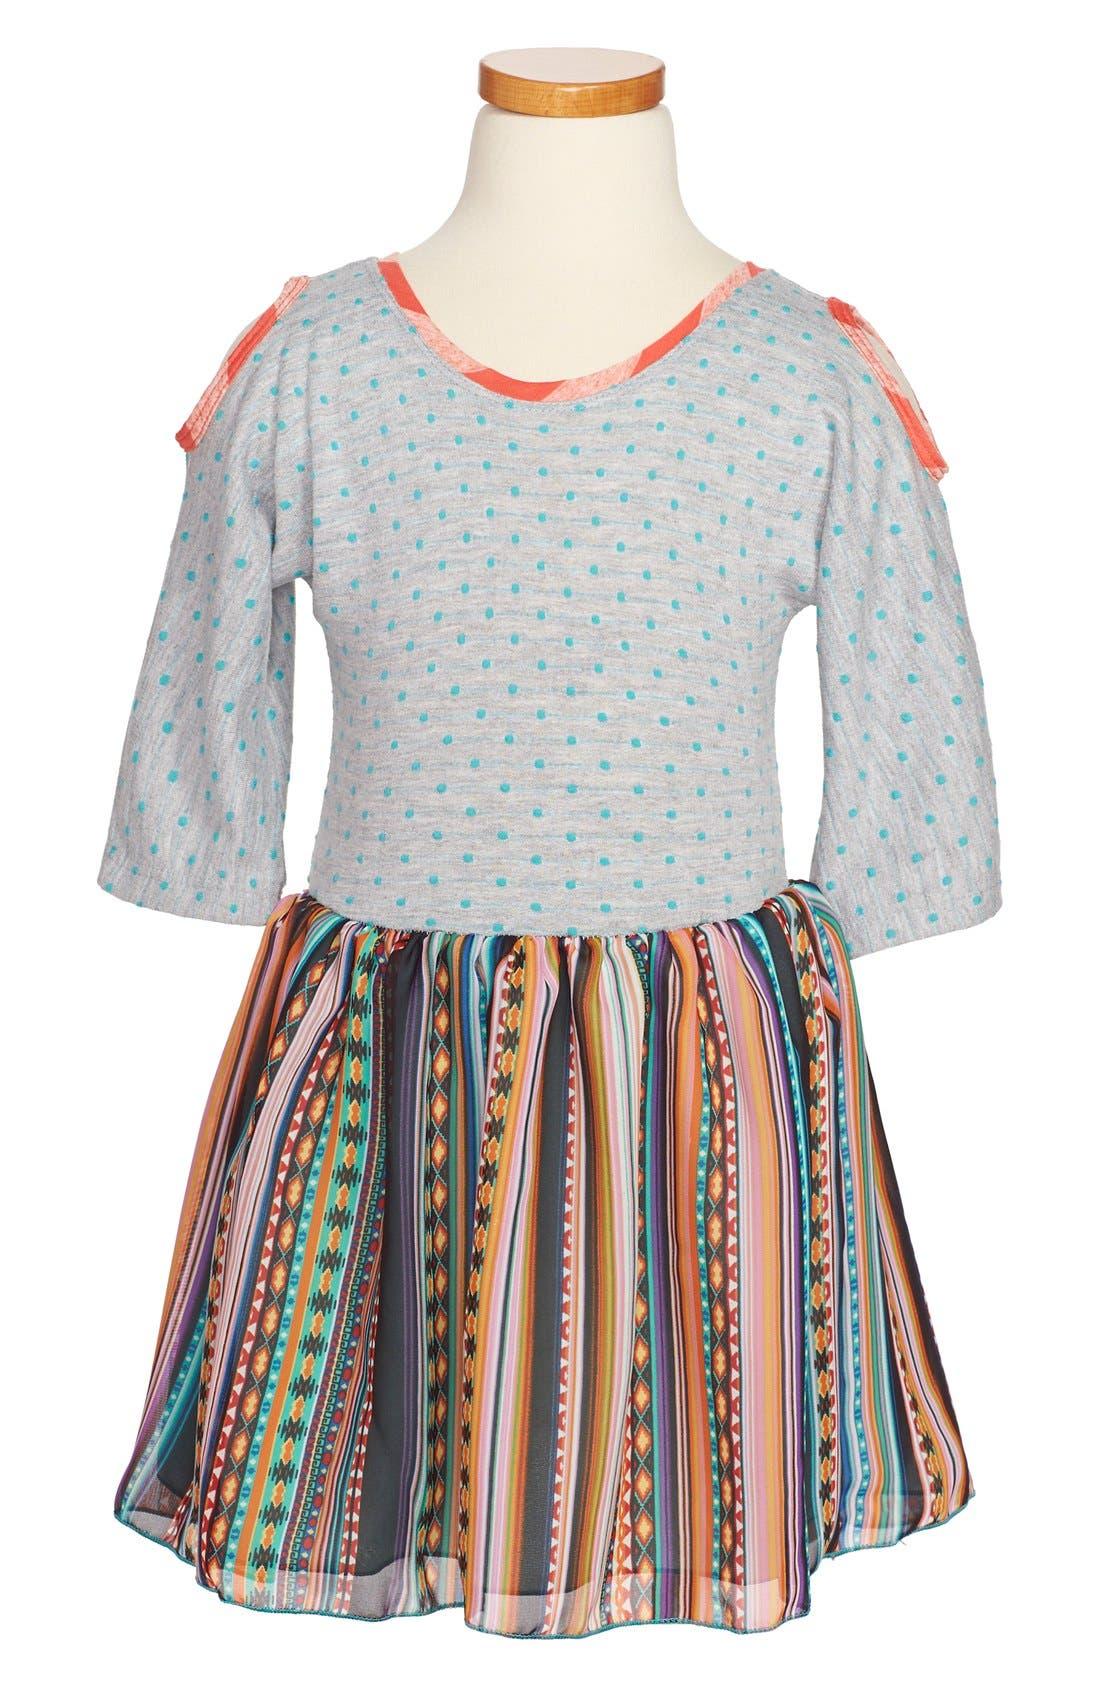 Alternate Image 1 Selected - Twirls & Twigs Knit-to-Woven Mixed Print Dress (Little Girls & Big Girls)